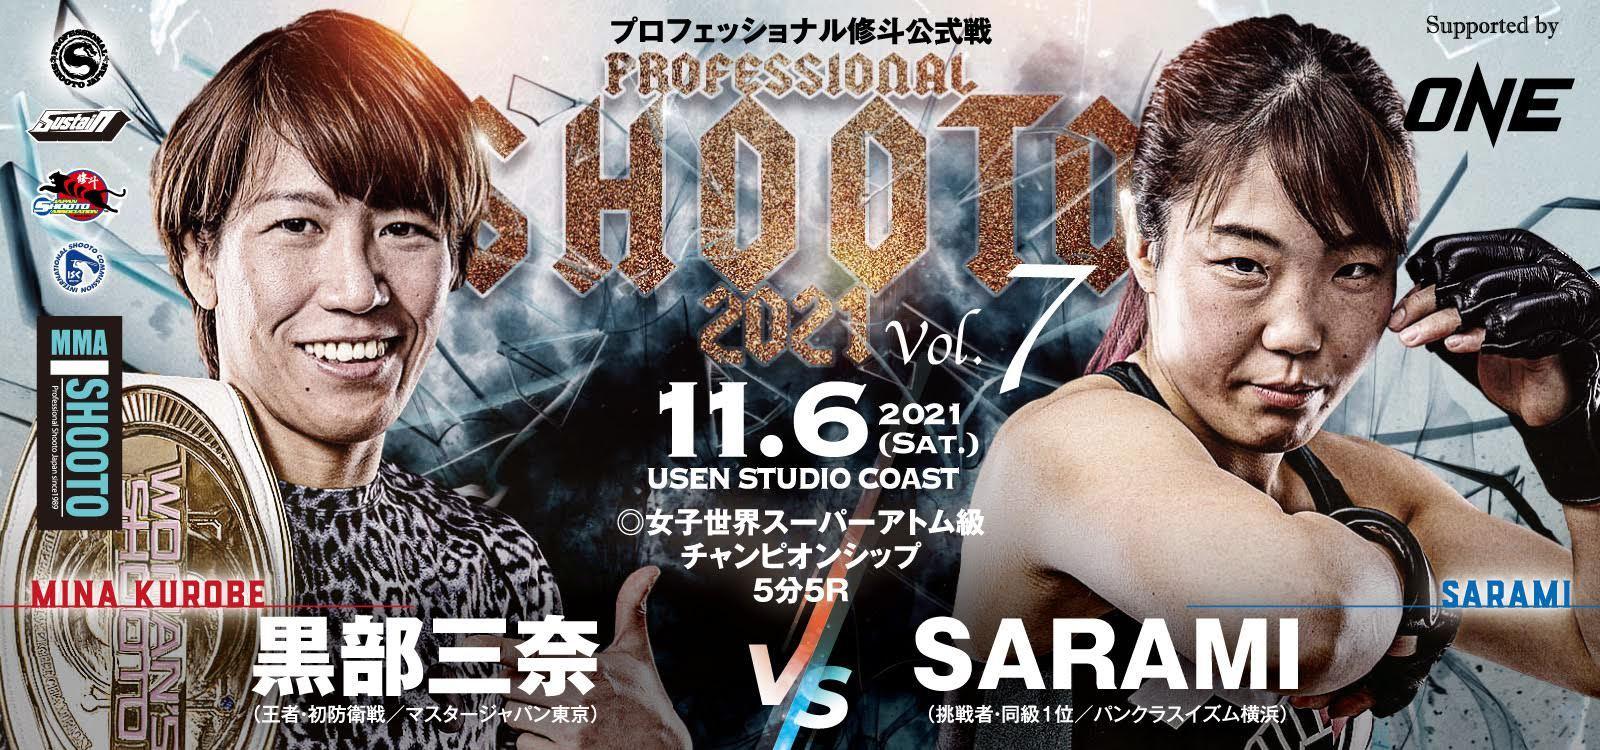 黒部三奈 vs SARAMI